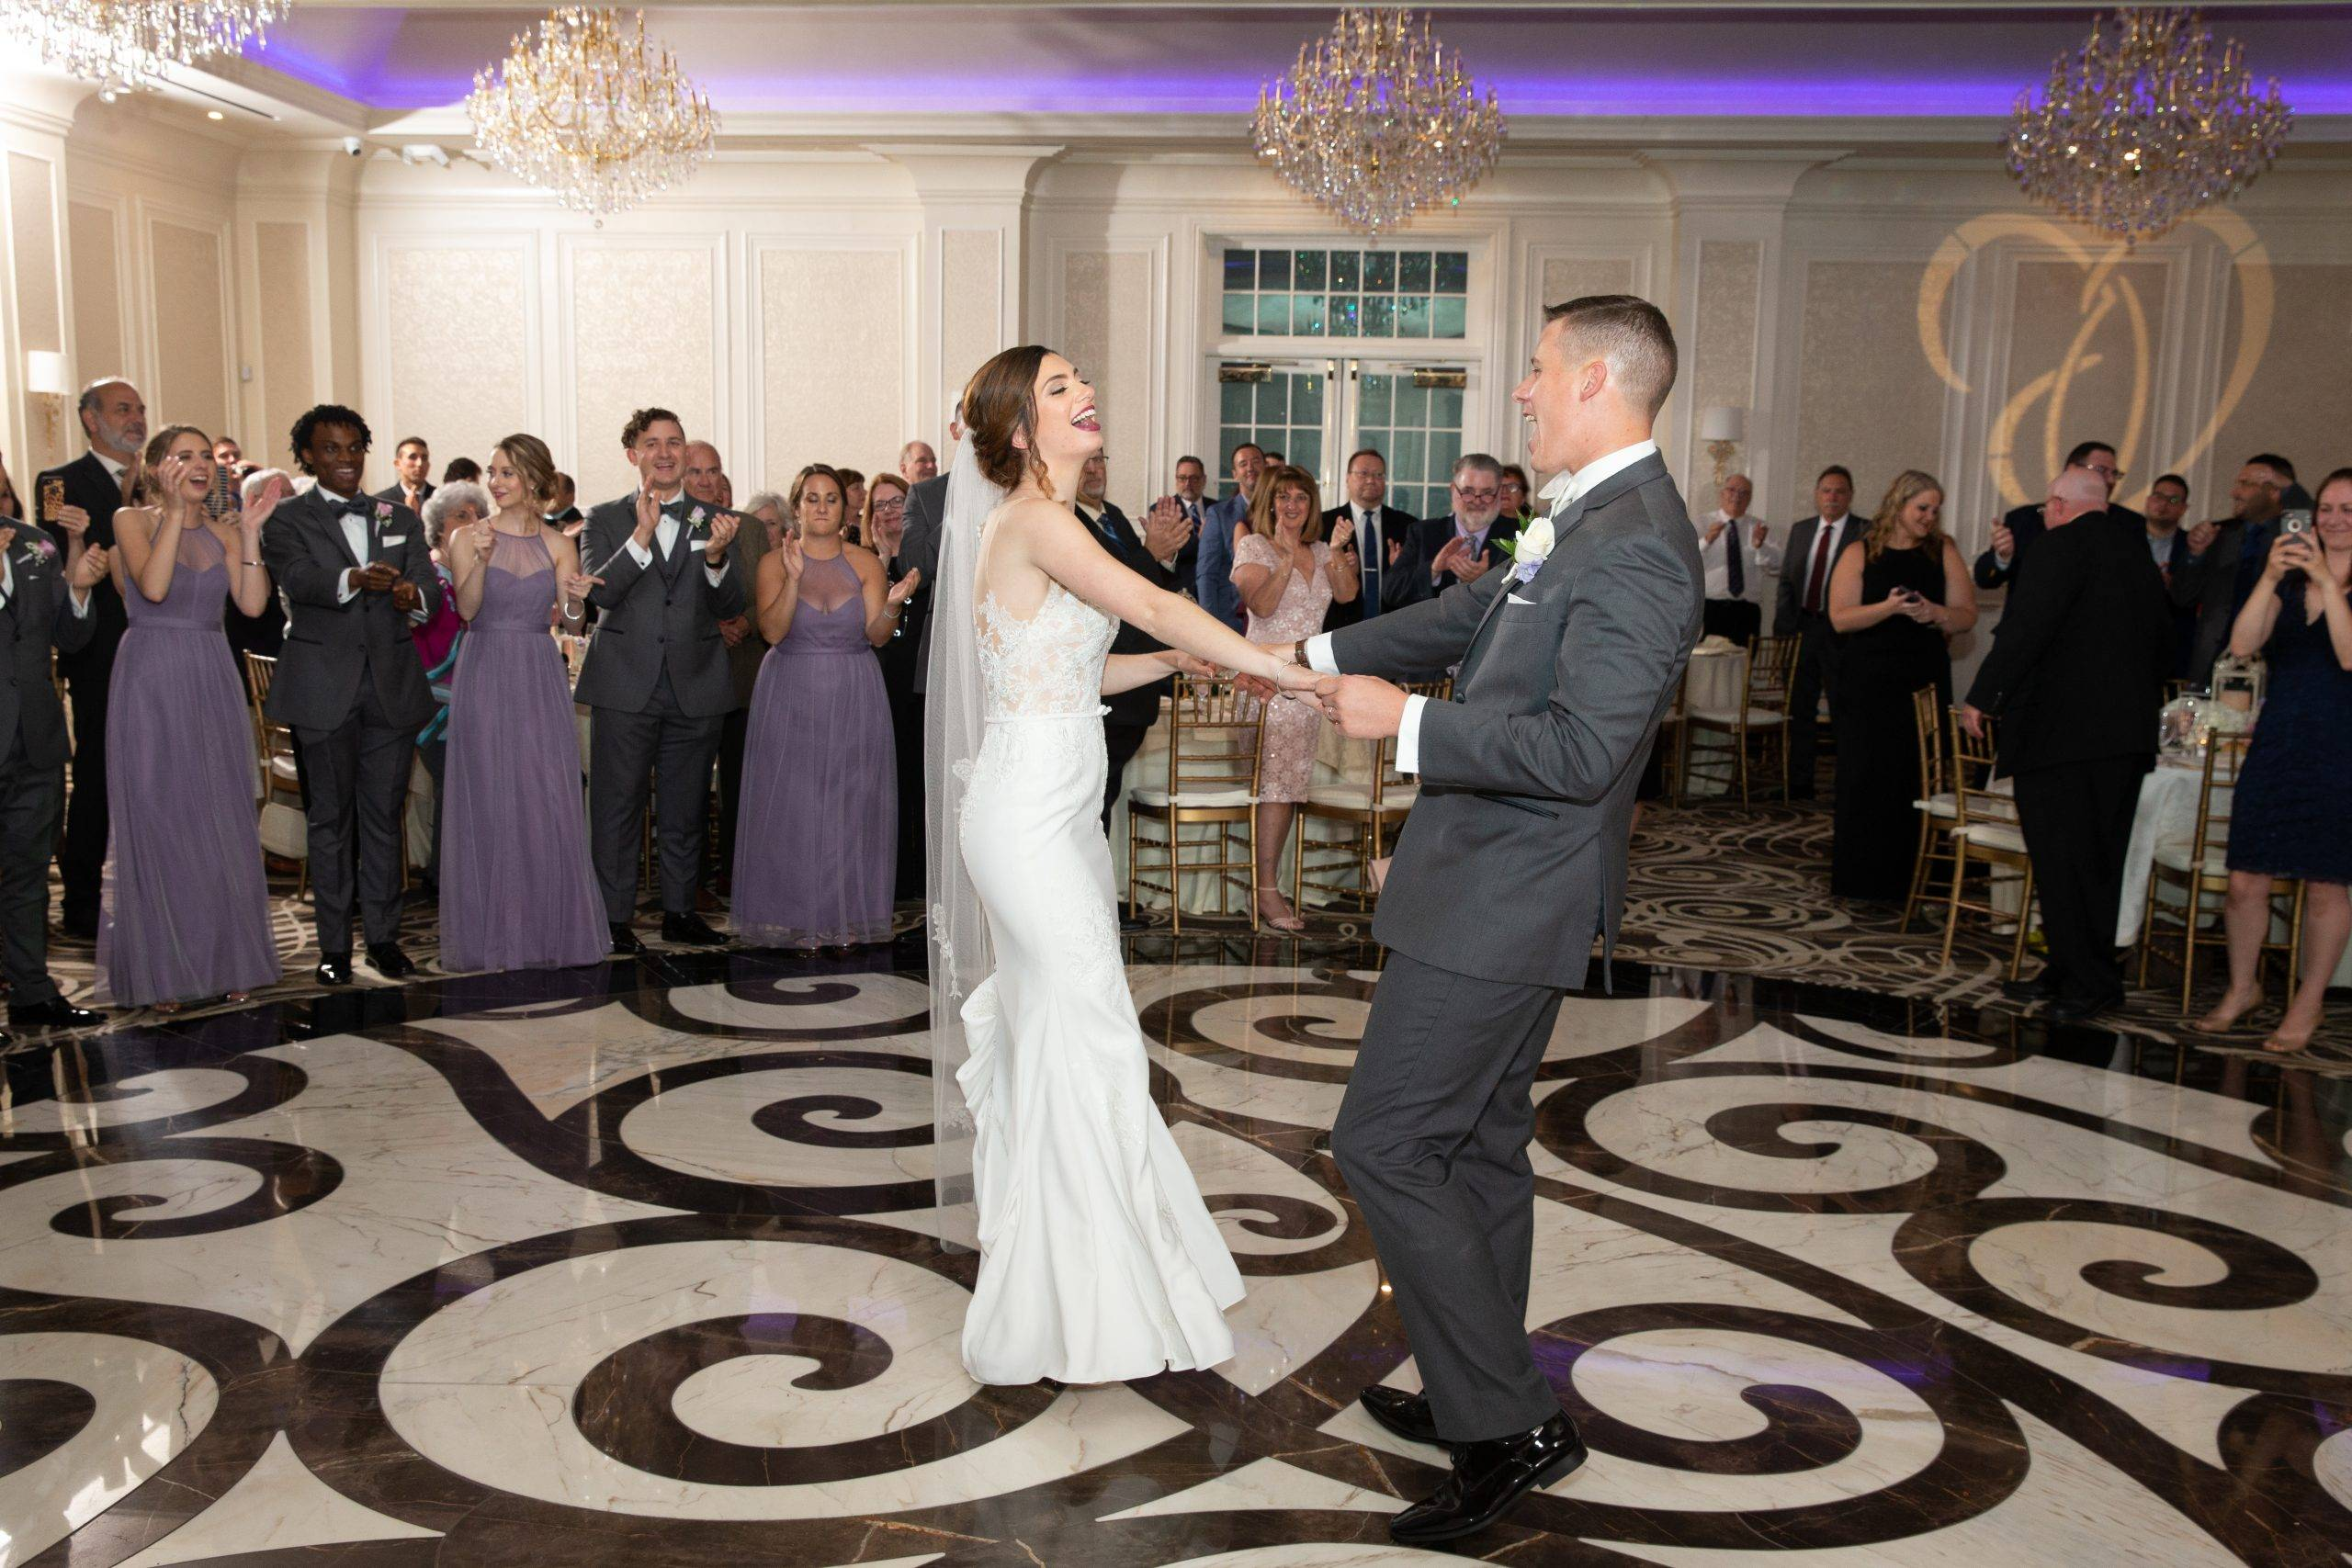 Meadow Wood bride and groom dance